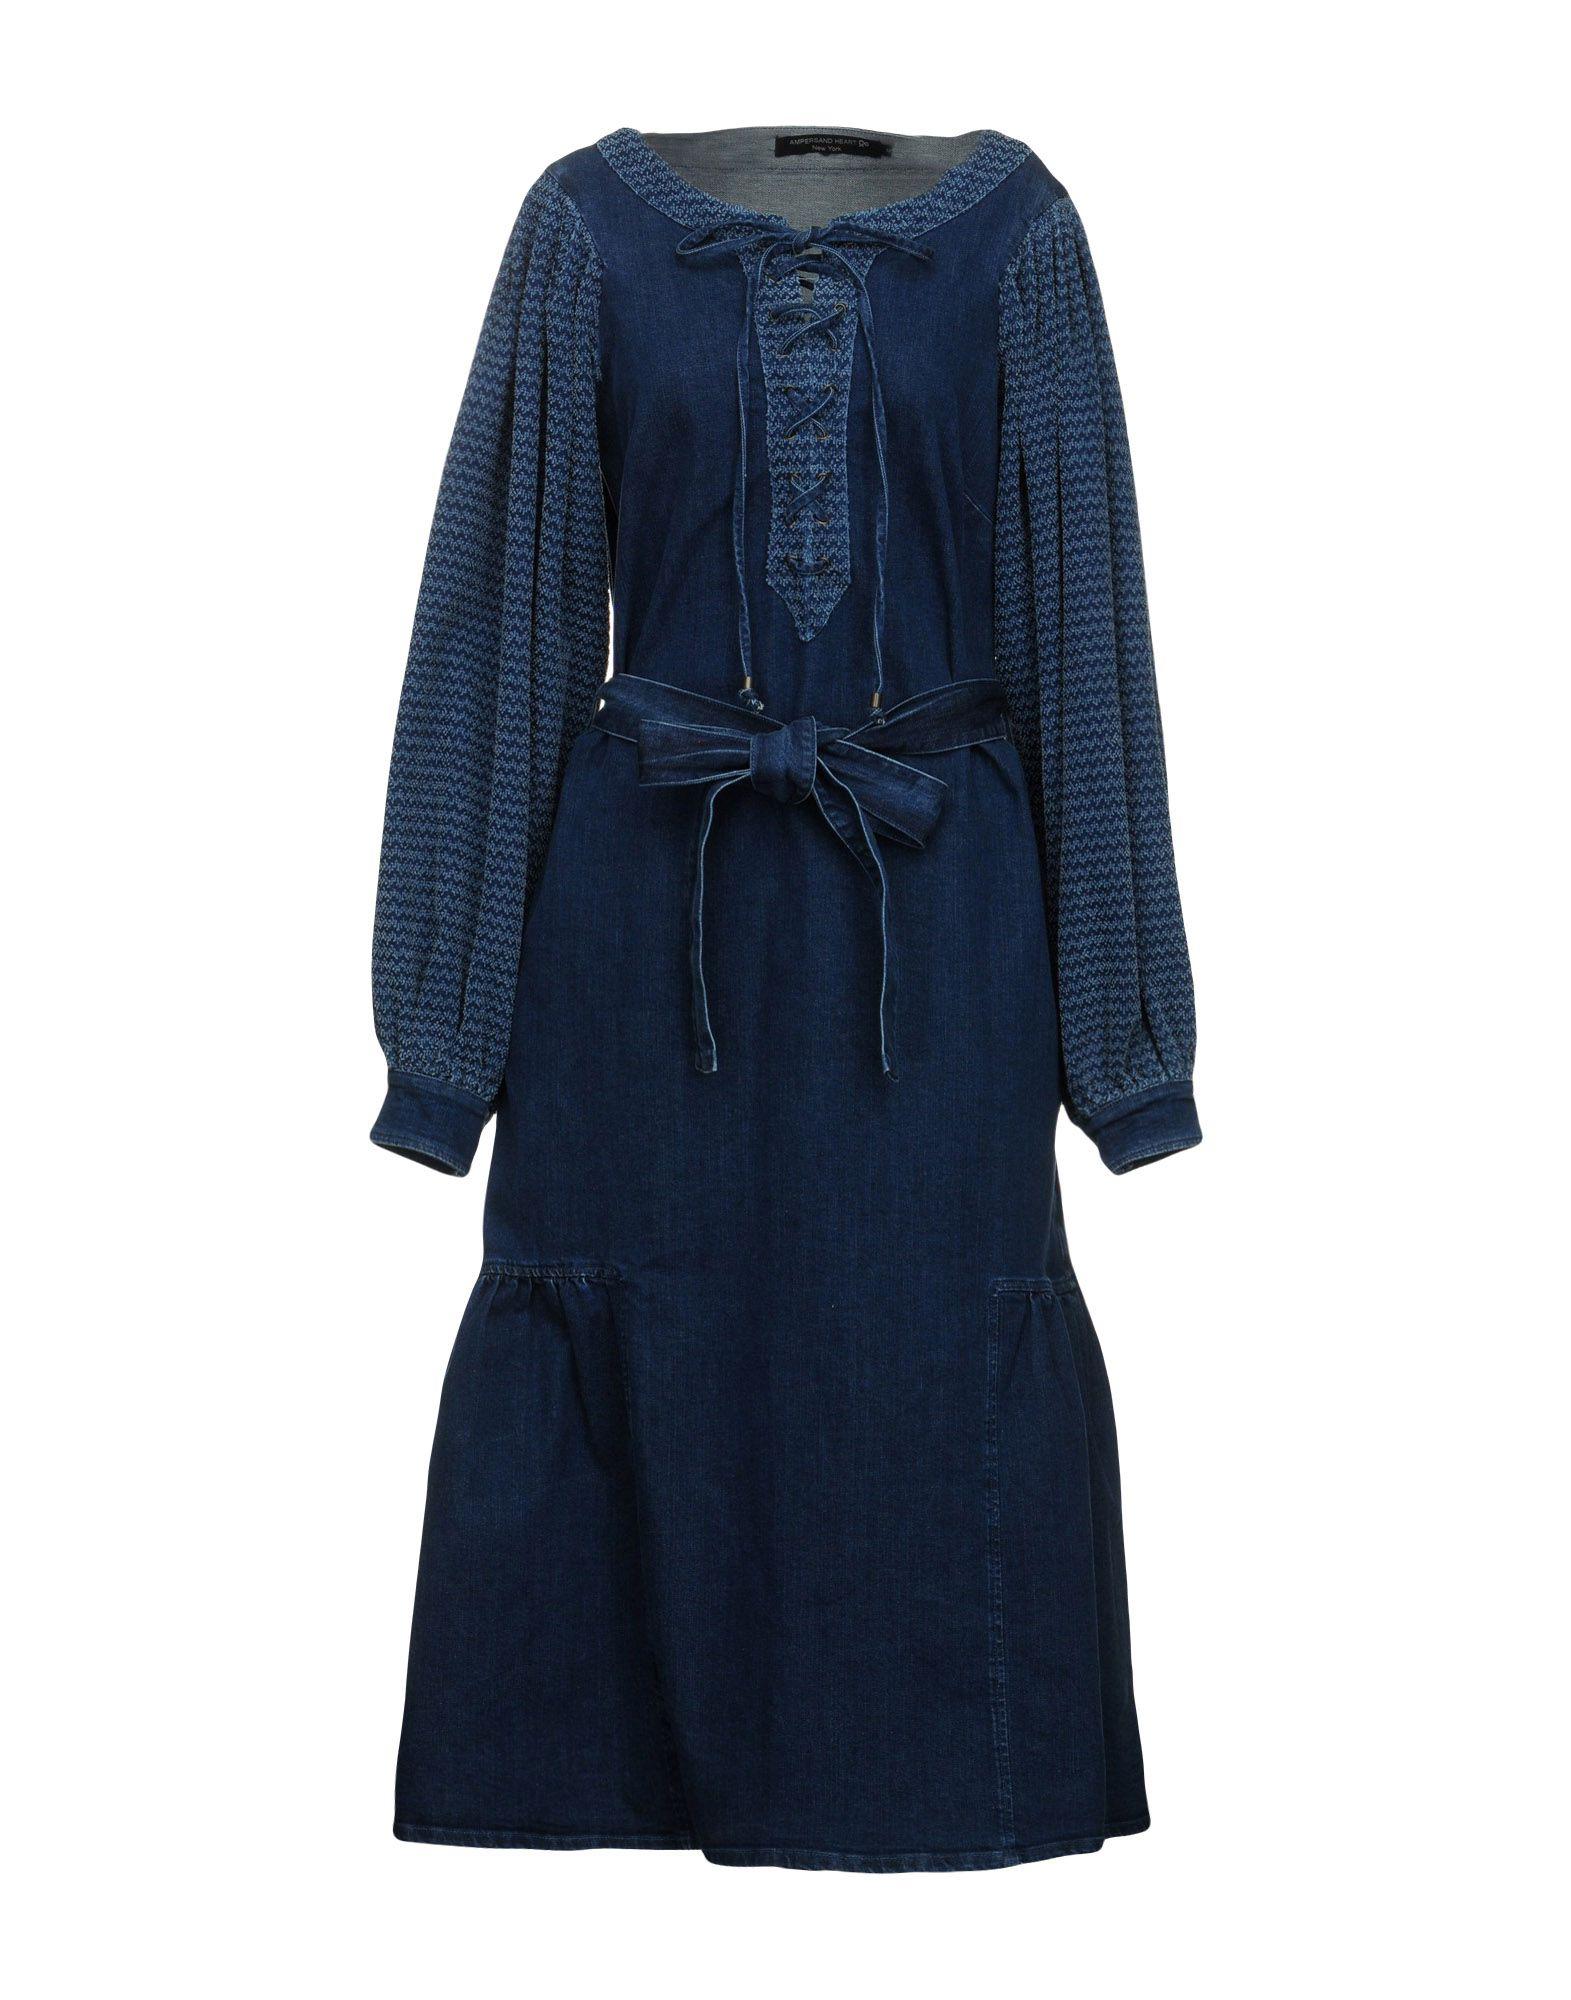 AMPERSAND HEART New York Платье длиной 3/4 ampersand heart new york джинсовая юбка